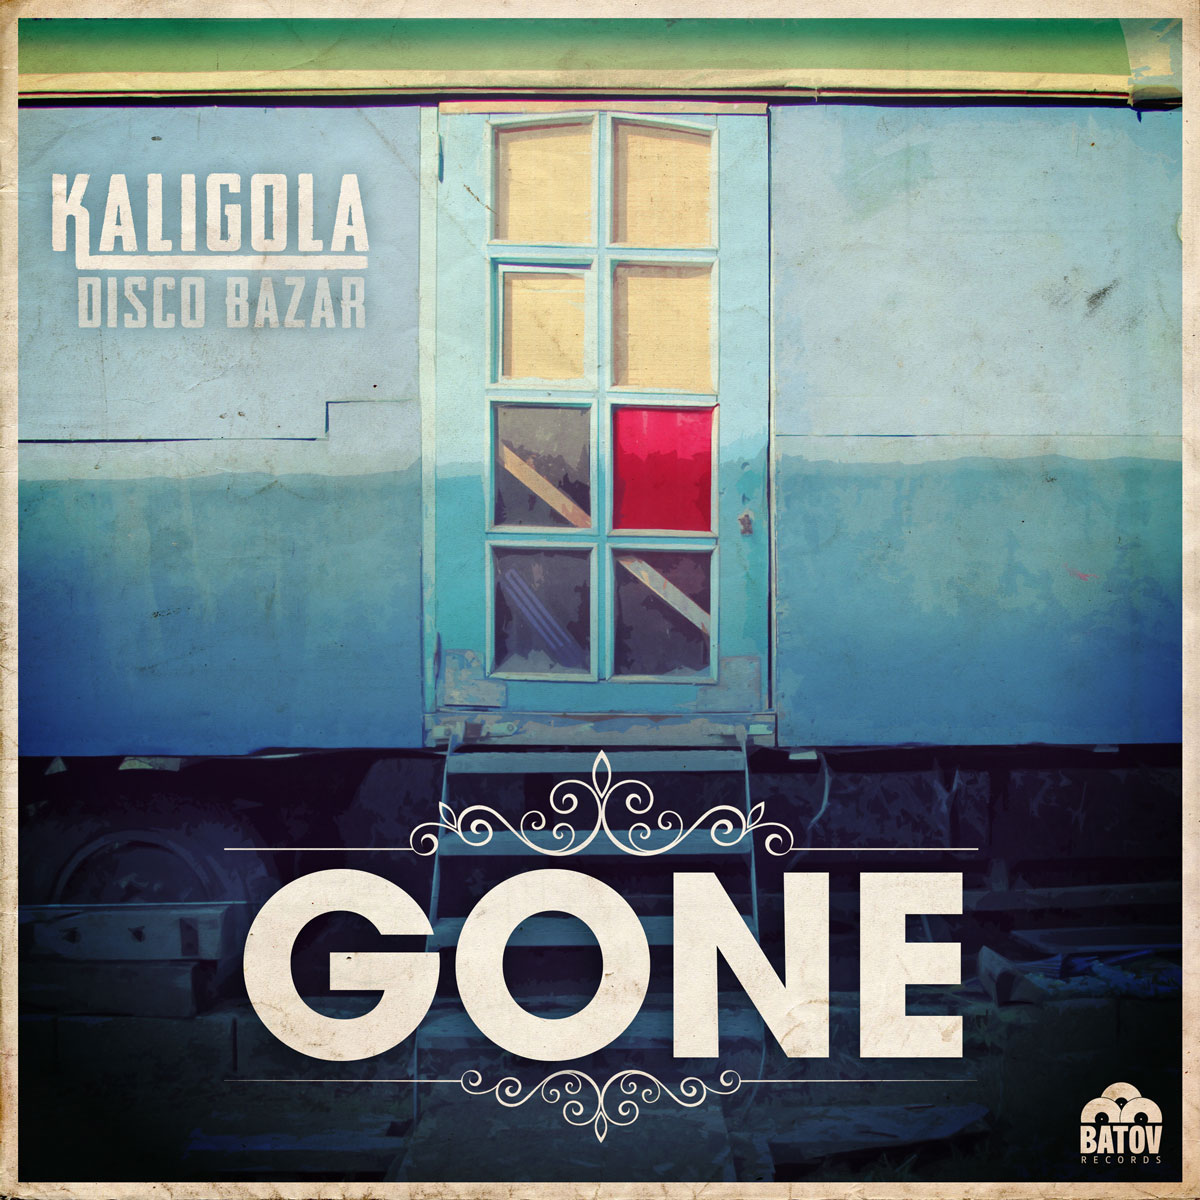 Kaligola Disco Bazar - Gone 4